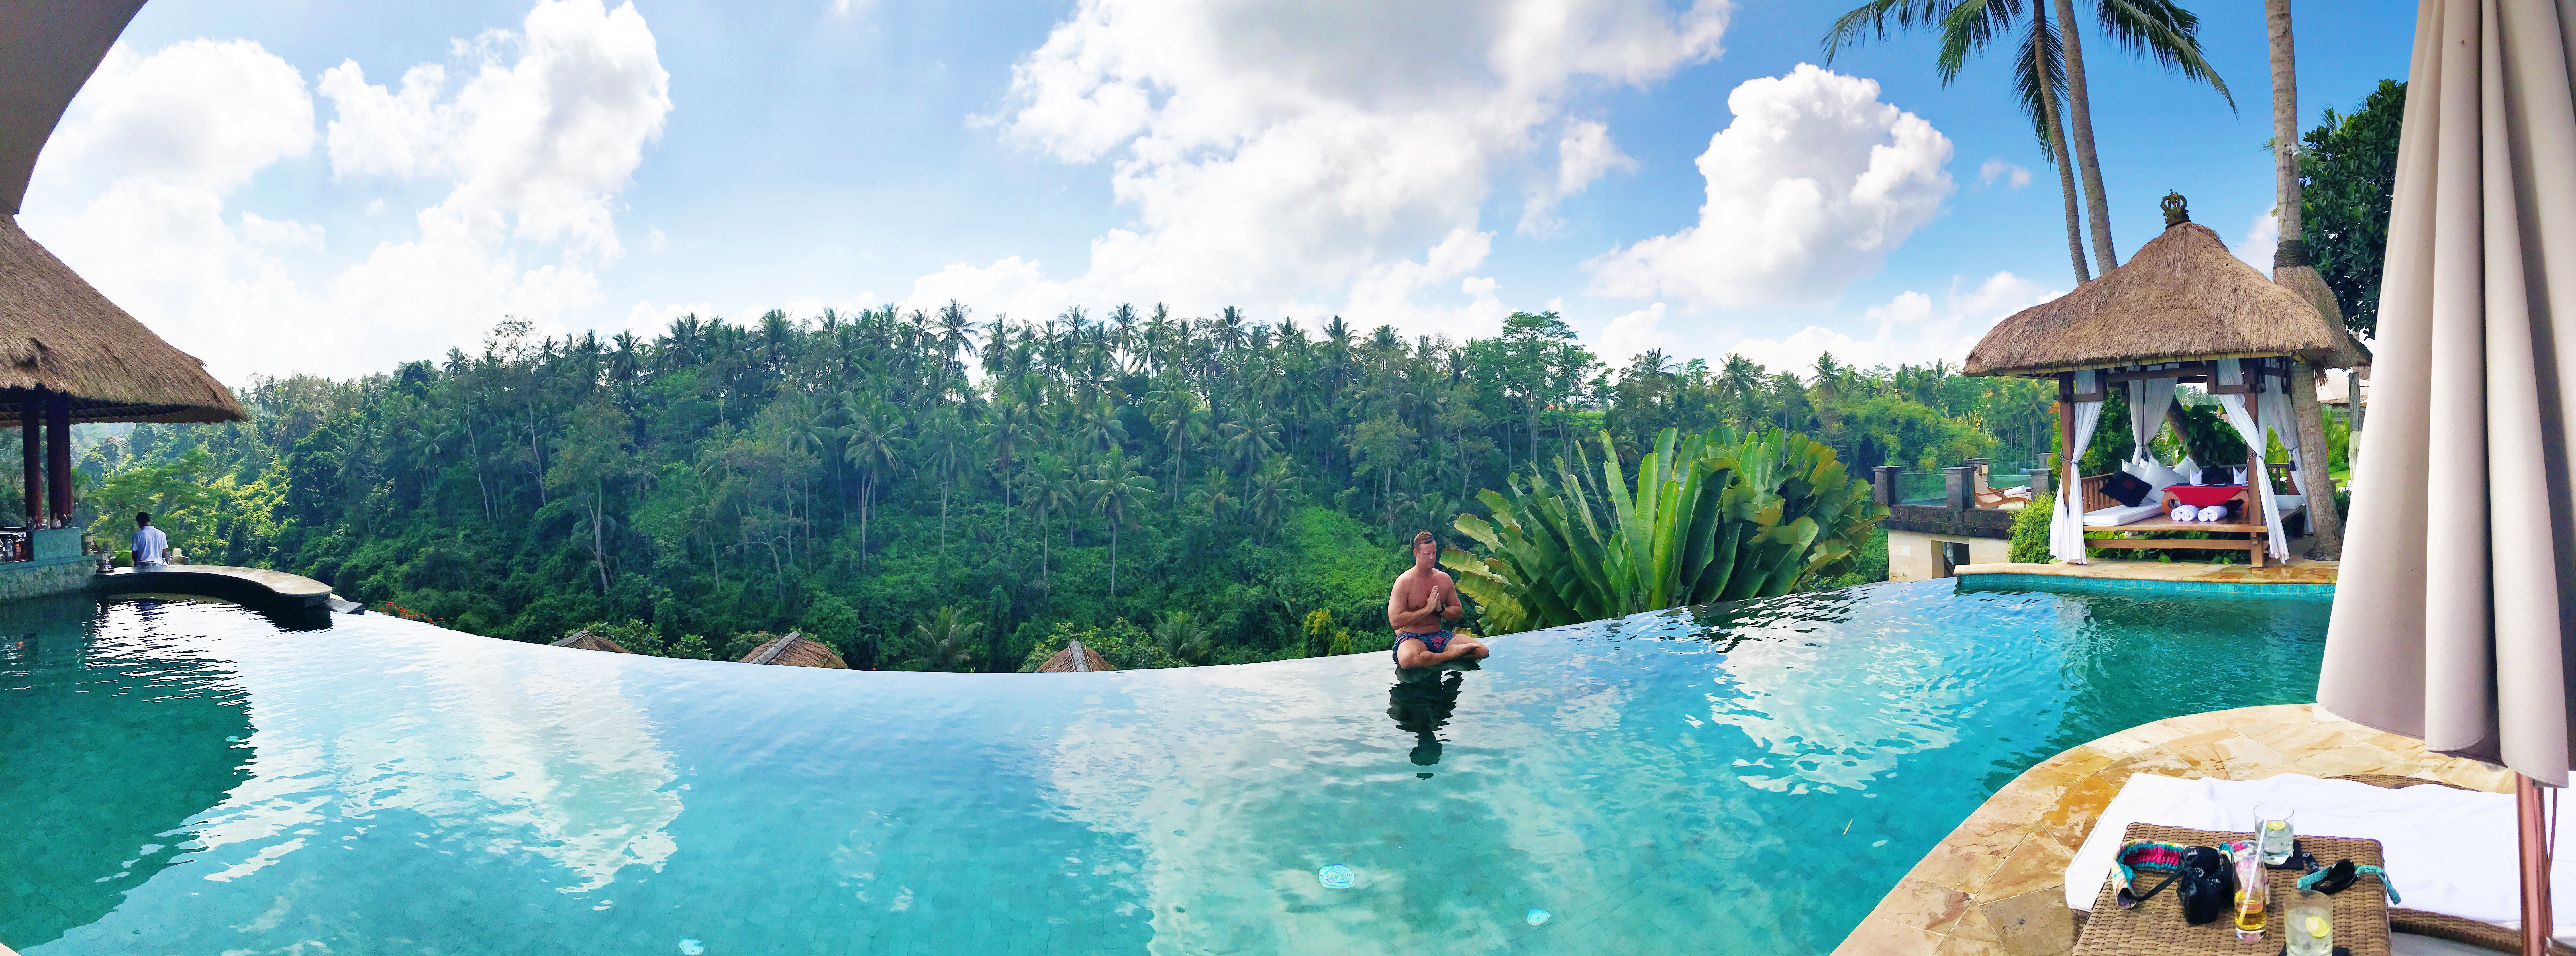 Our Stay At Viceroy Bali - Ubud, Bali, Indonesia - The Viceroy Bali, Luxury Hotel - Communikait